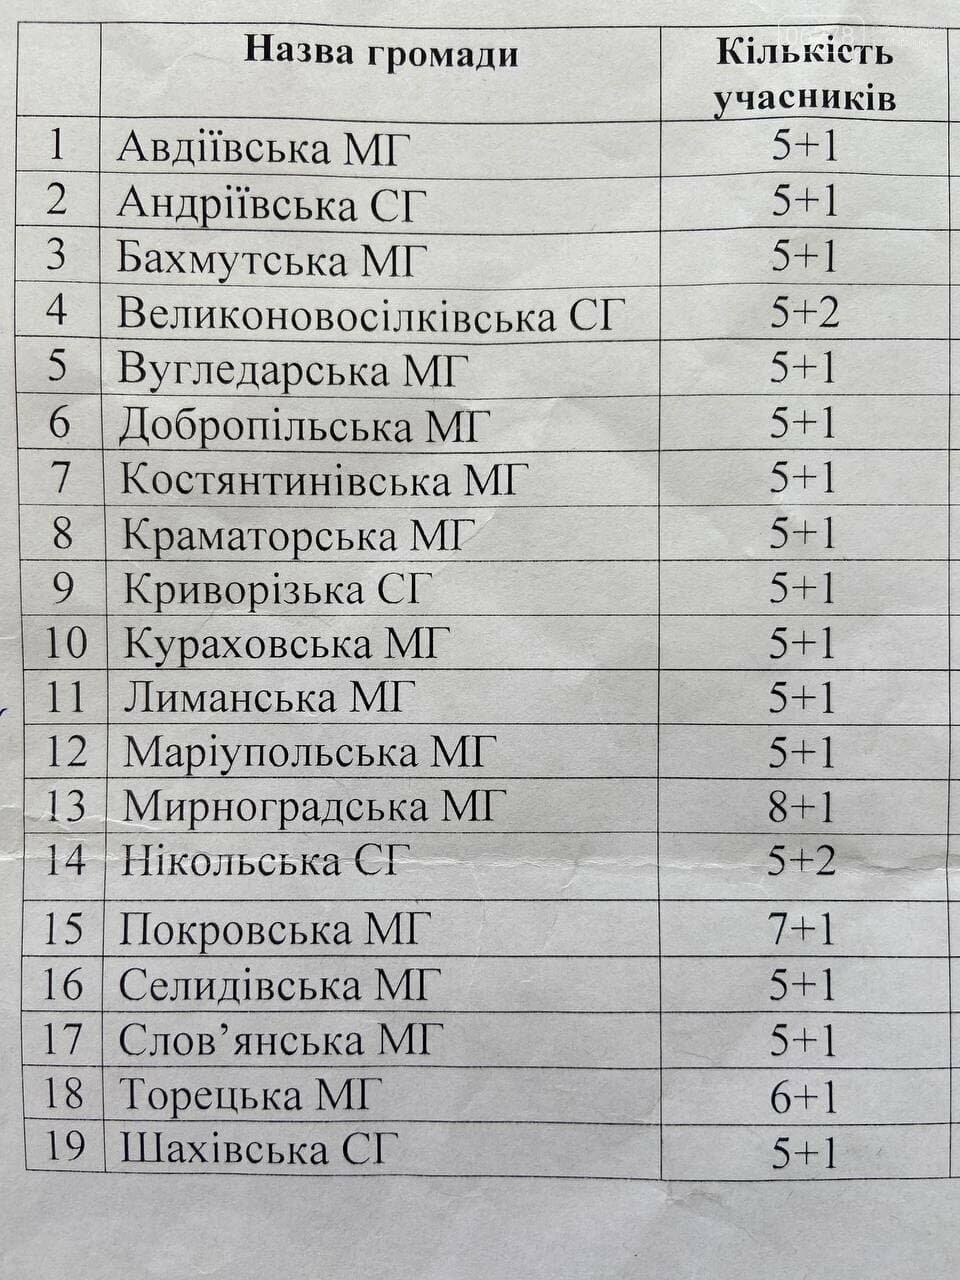 Спартакиада в Курахово, сайт Курахово и Марьинка